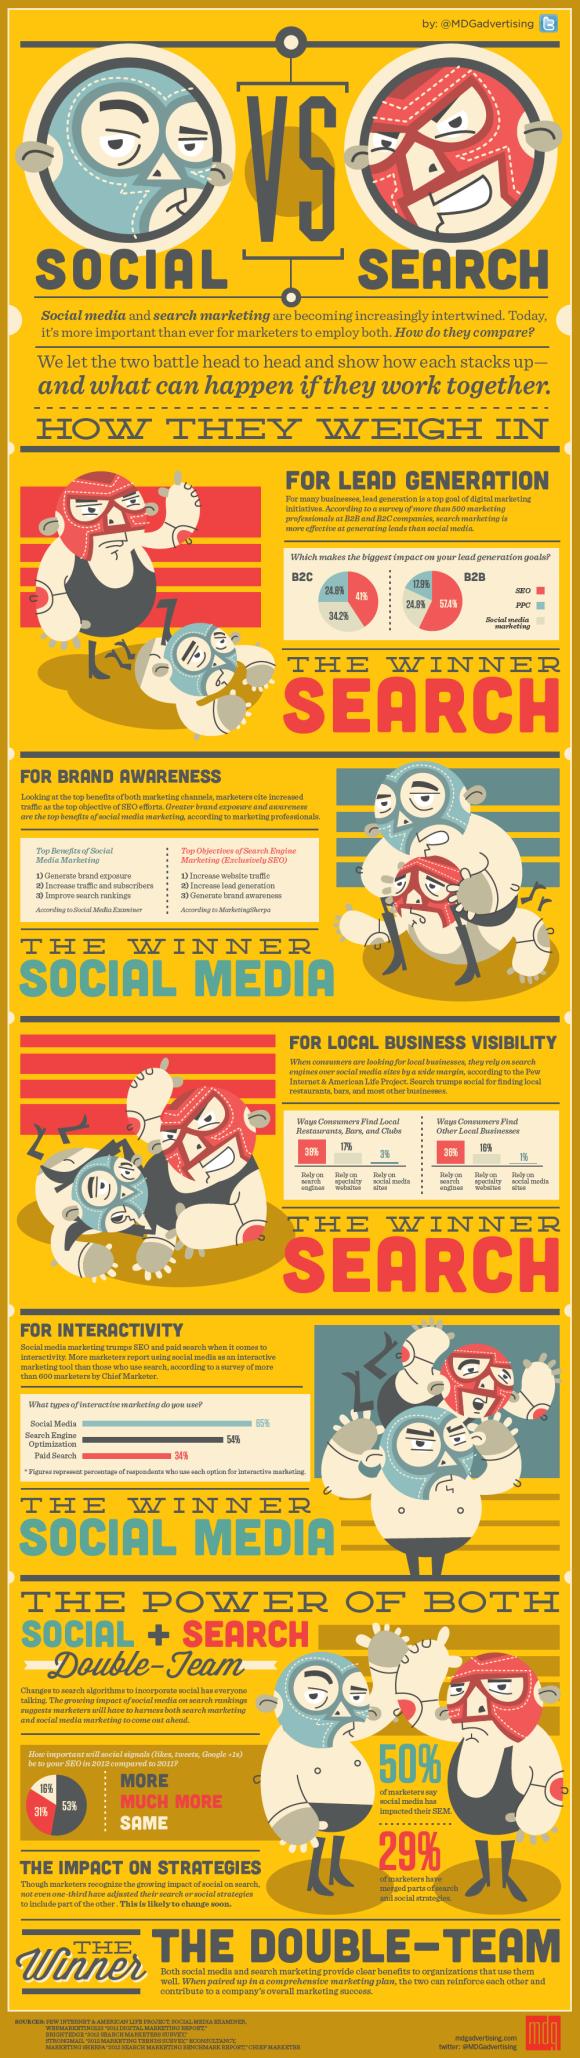 Social Media vs Seach Marketing - How Do They Match Up?